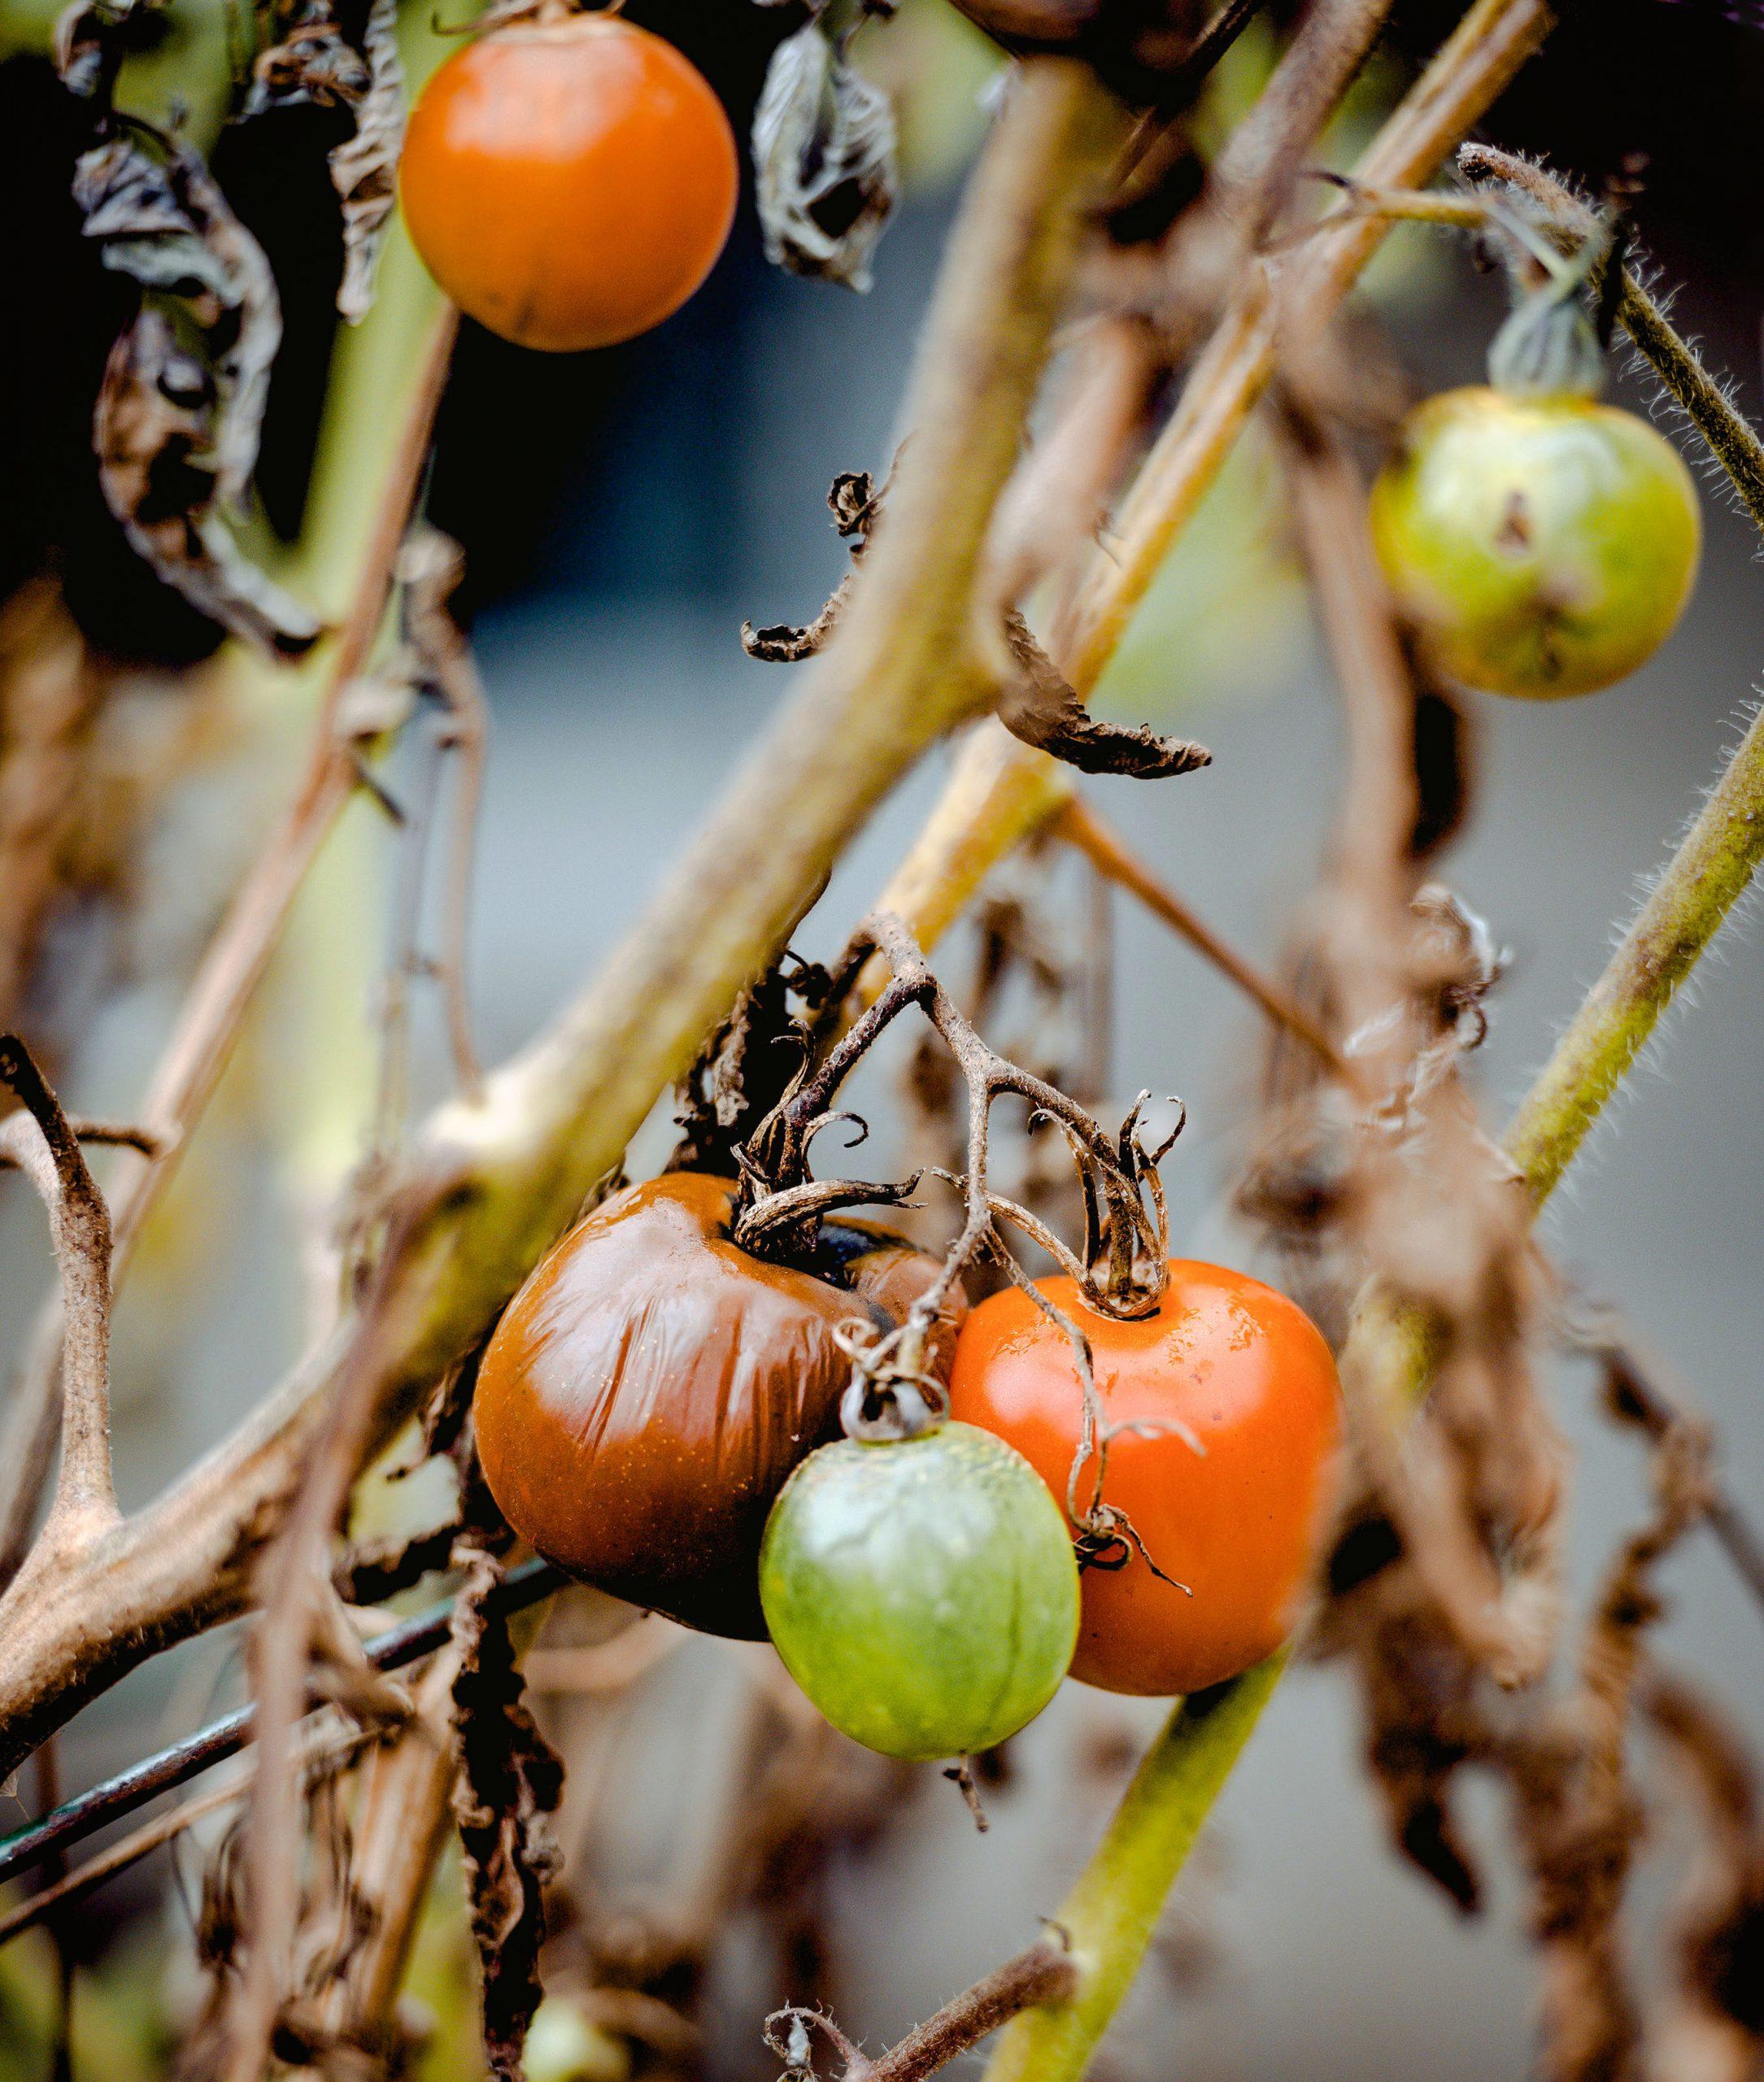 pomidorų maras